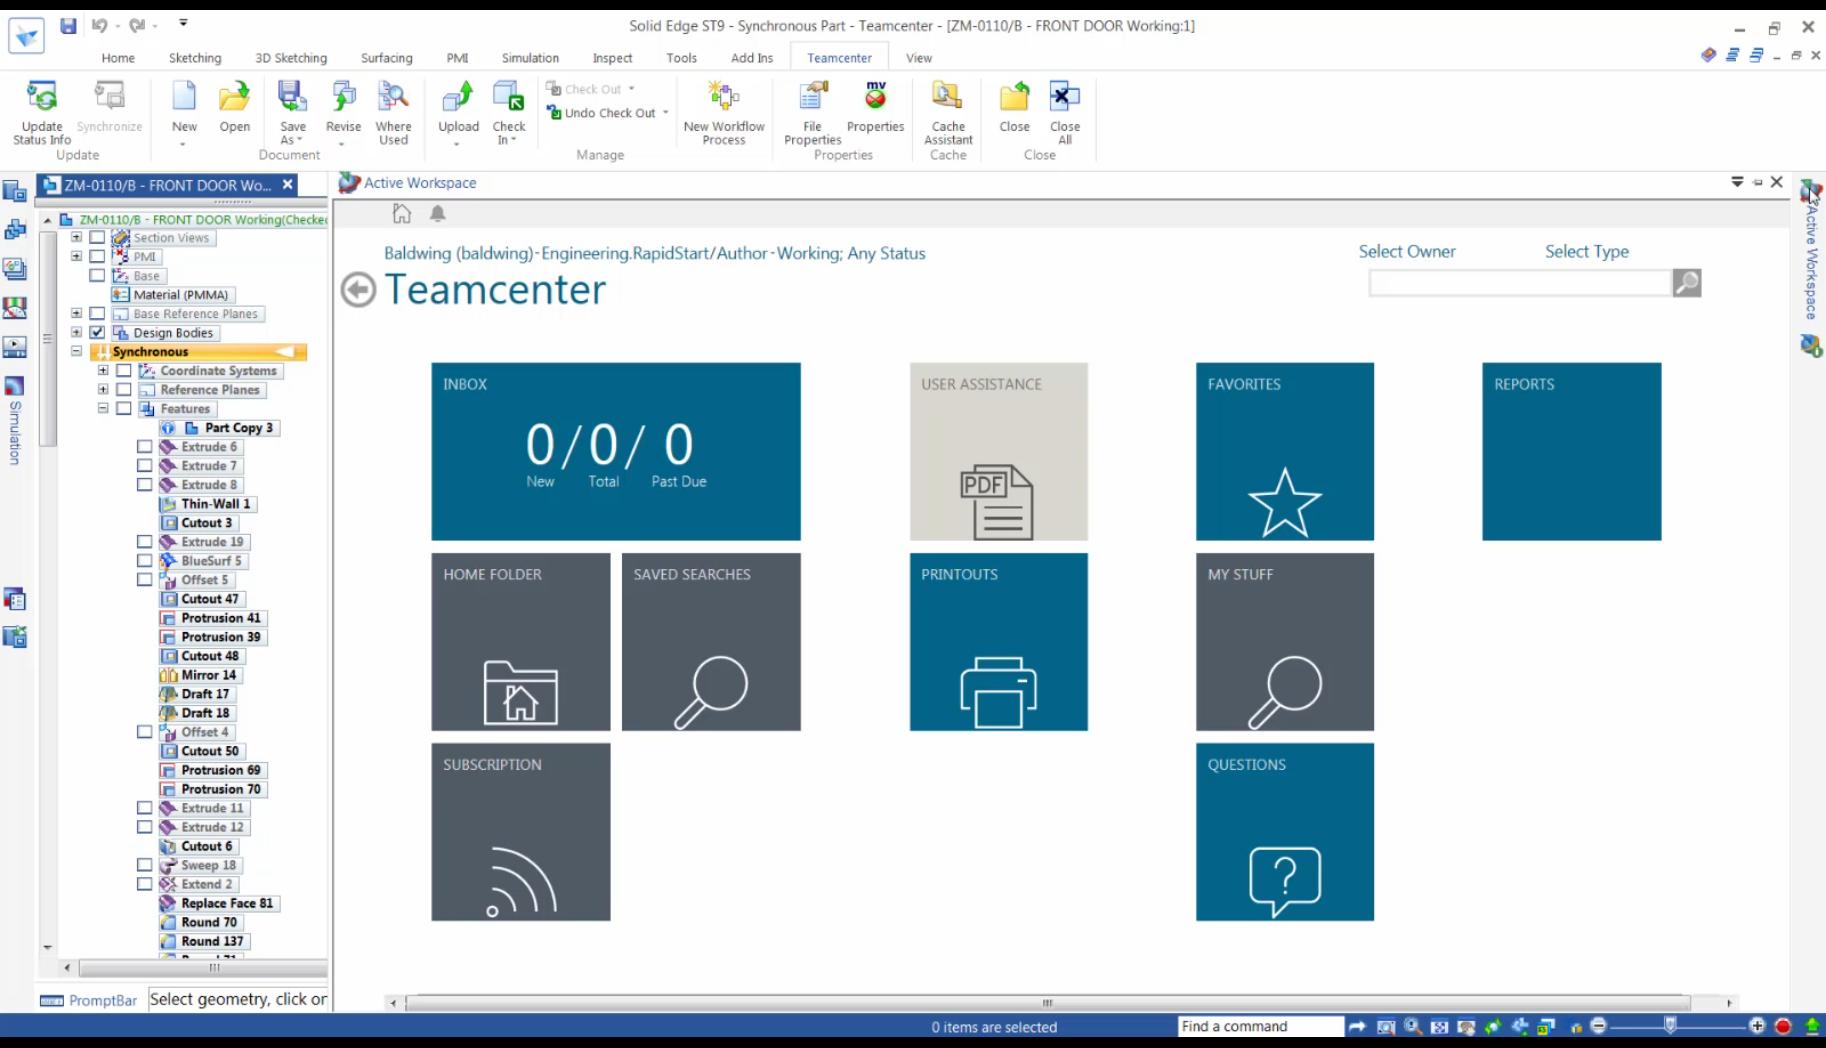 Aktywny obszar roboczy - integrator Teamcenter dla Solid Edge ST9